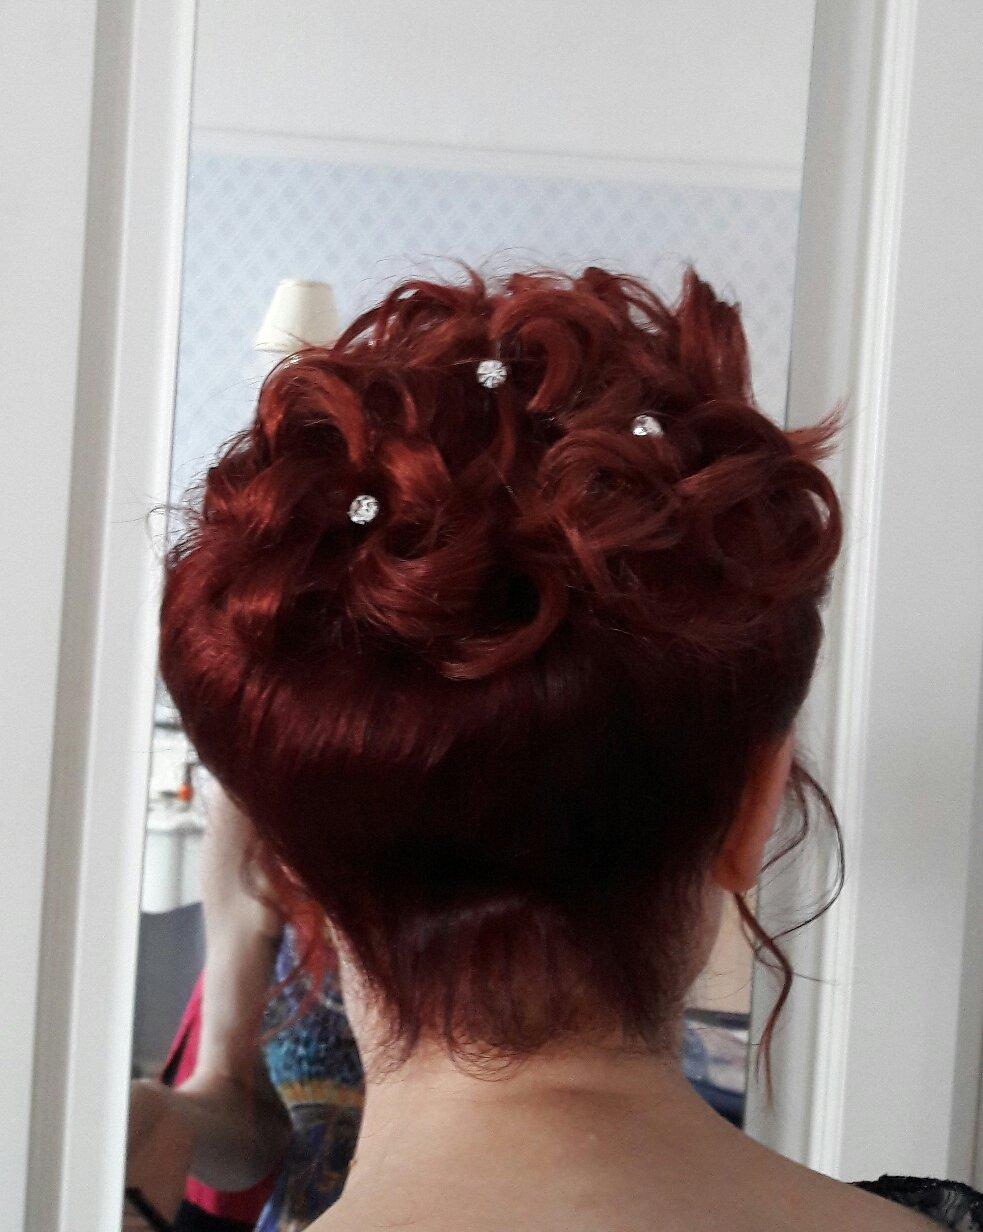 A classic hair style